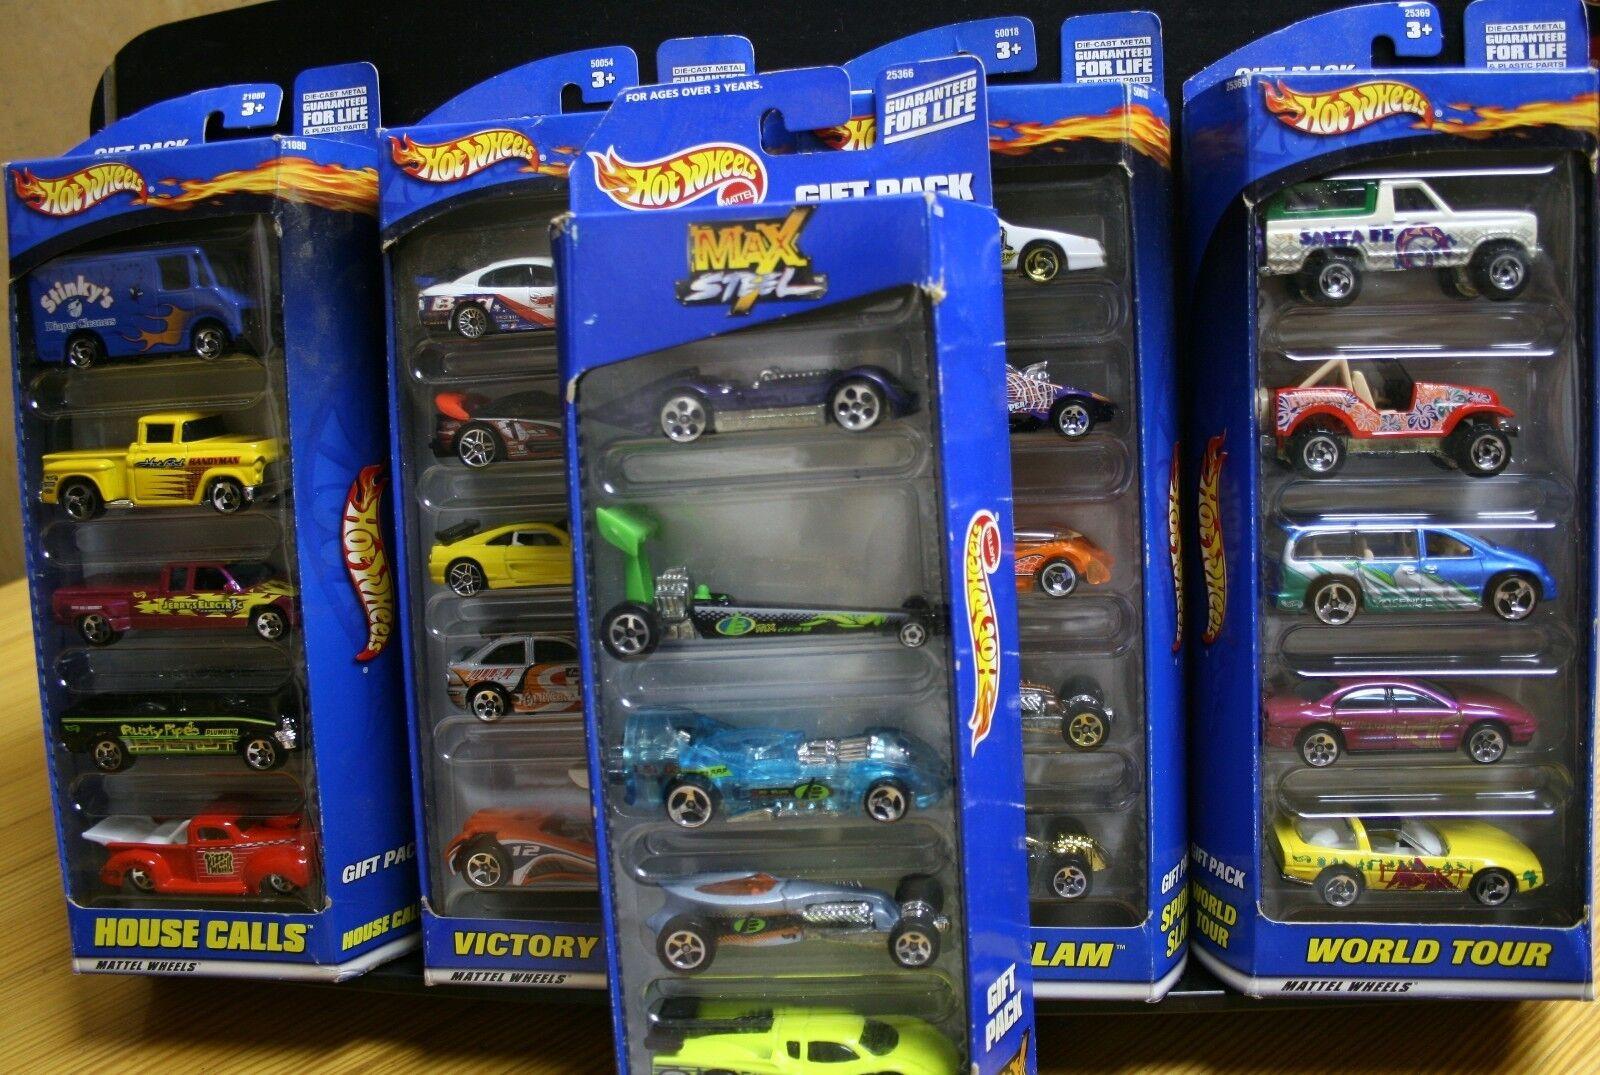 ahorra hasta un 80% 5 nuevos paquetes paquetes paquetes de regalo Hot Wheels 25 coches casa llamadas Victoria Lane Araña Max Tour  calidad fantástica